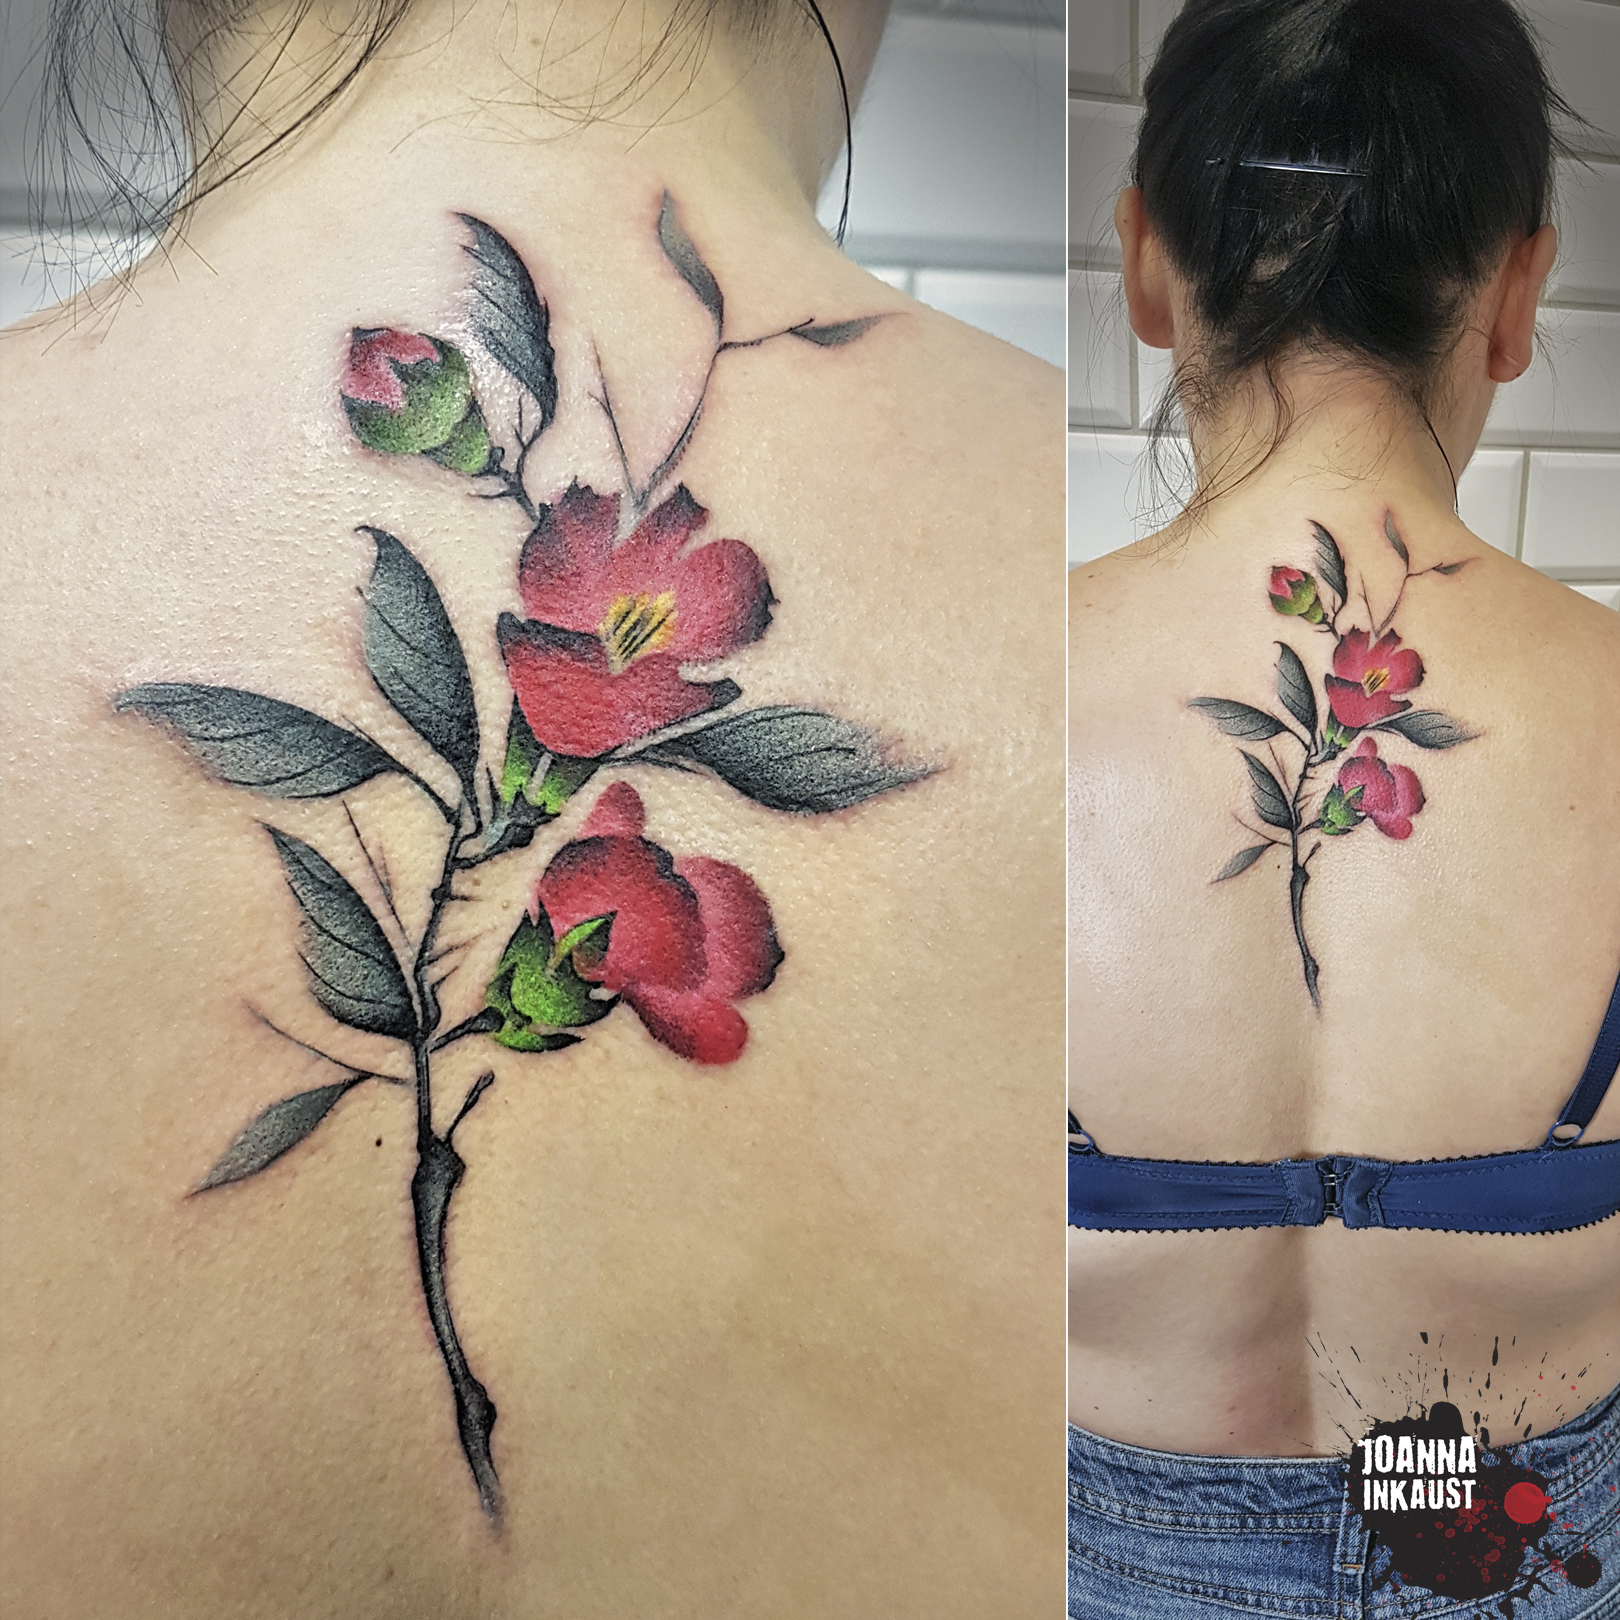 Inksearch tattoo Joanna Inkaust